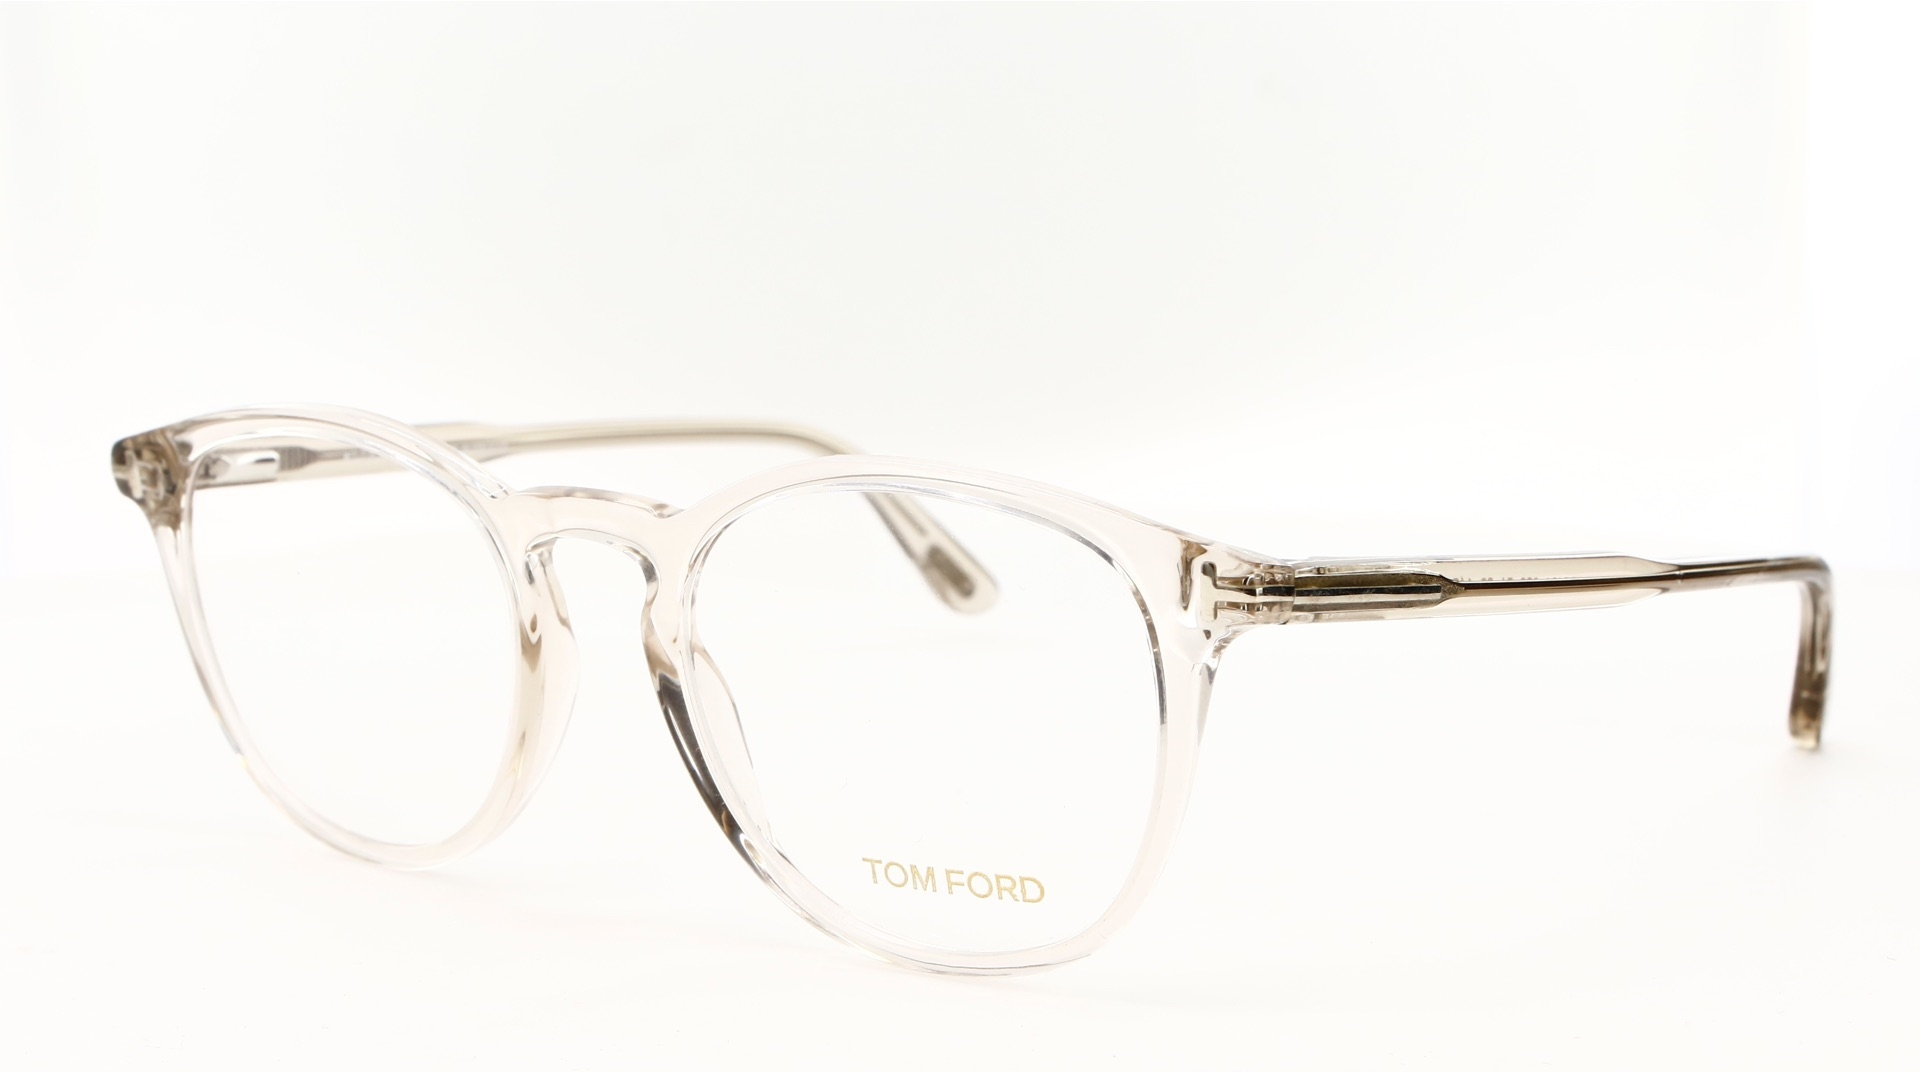 Tom Ford - ref: 76460